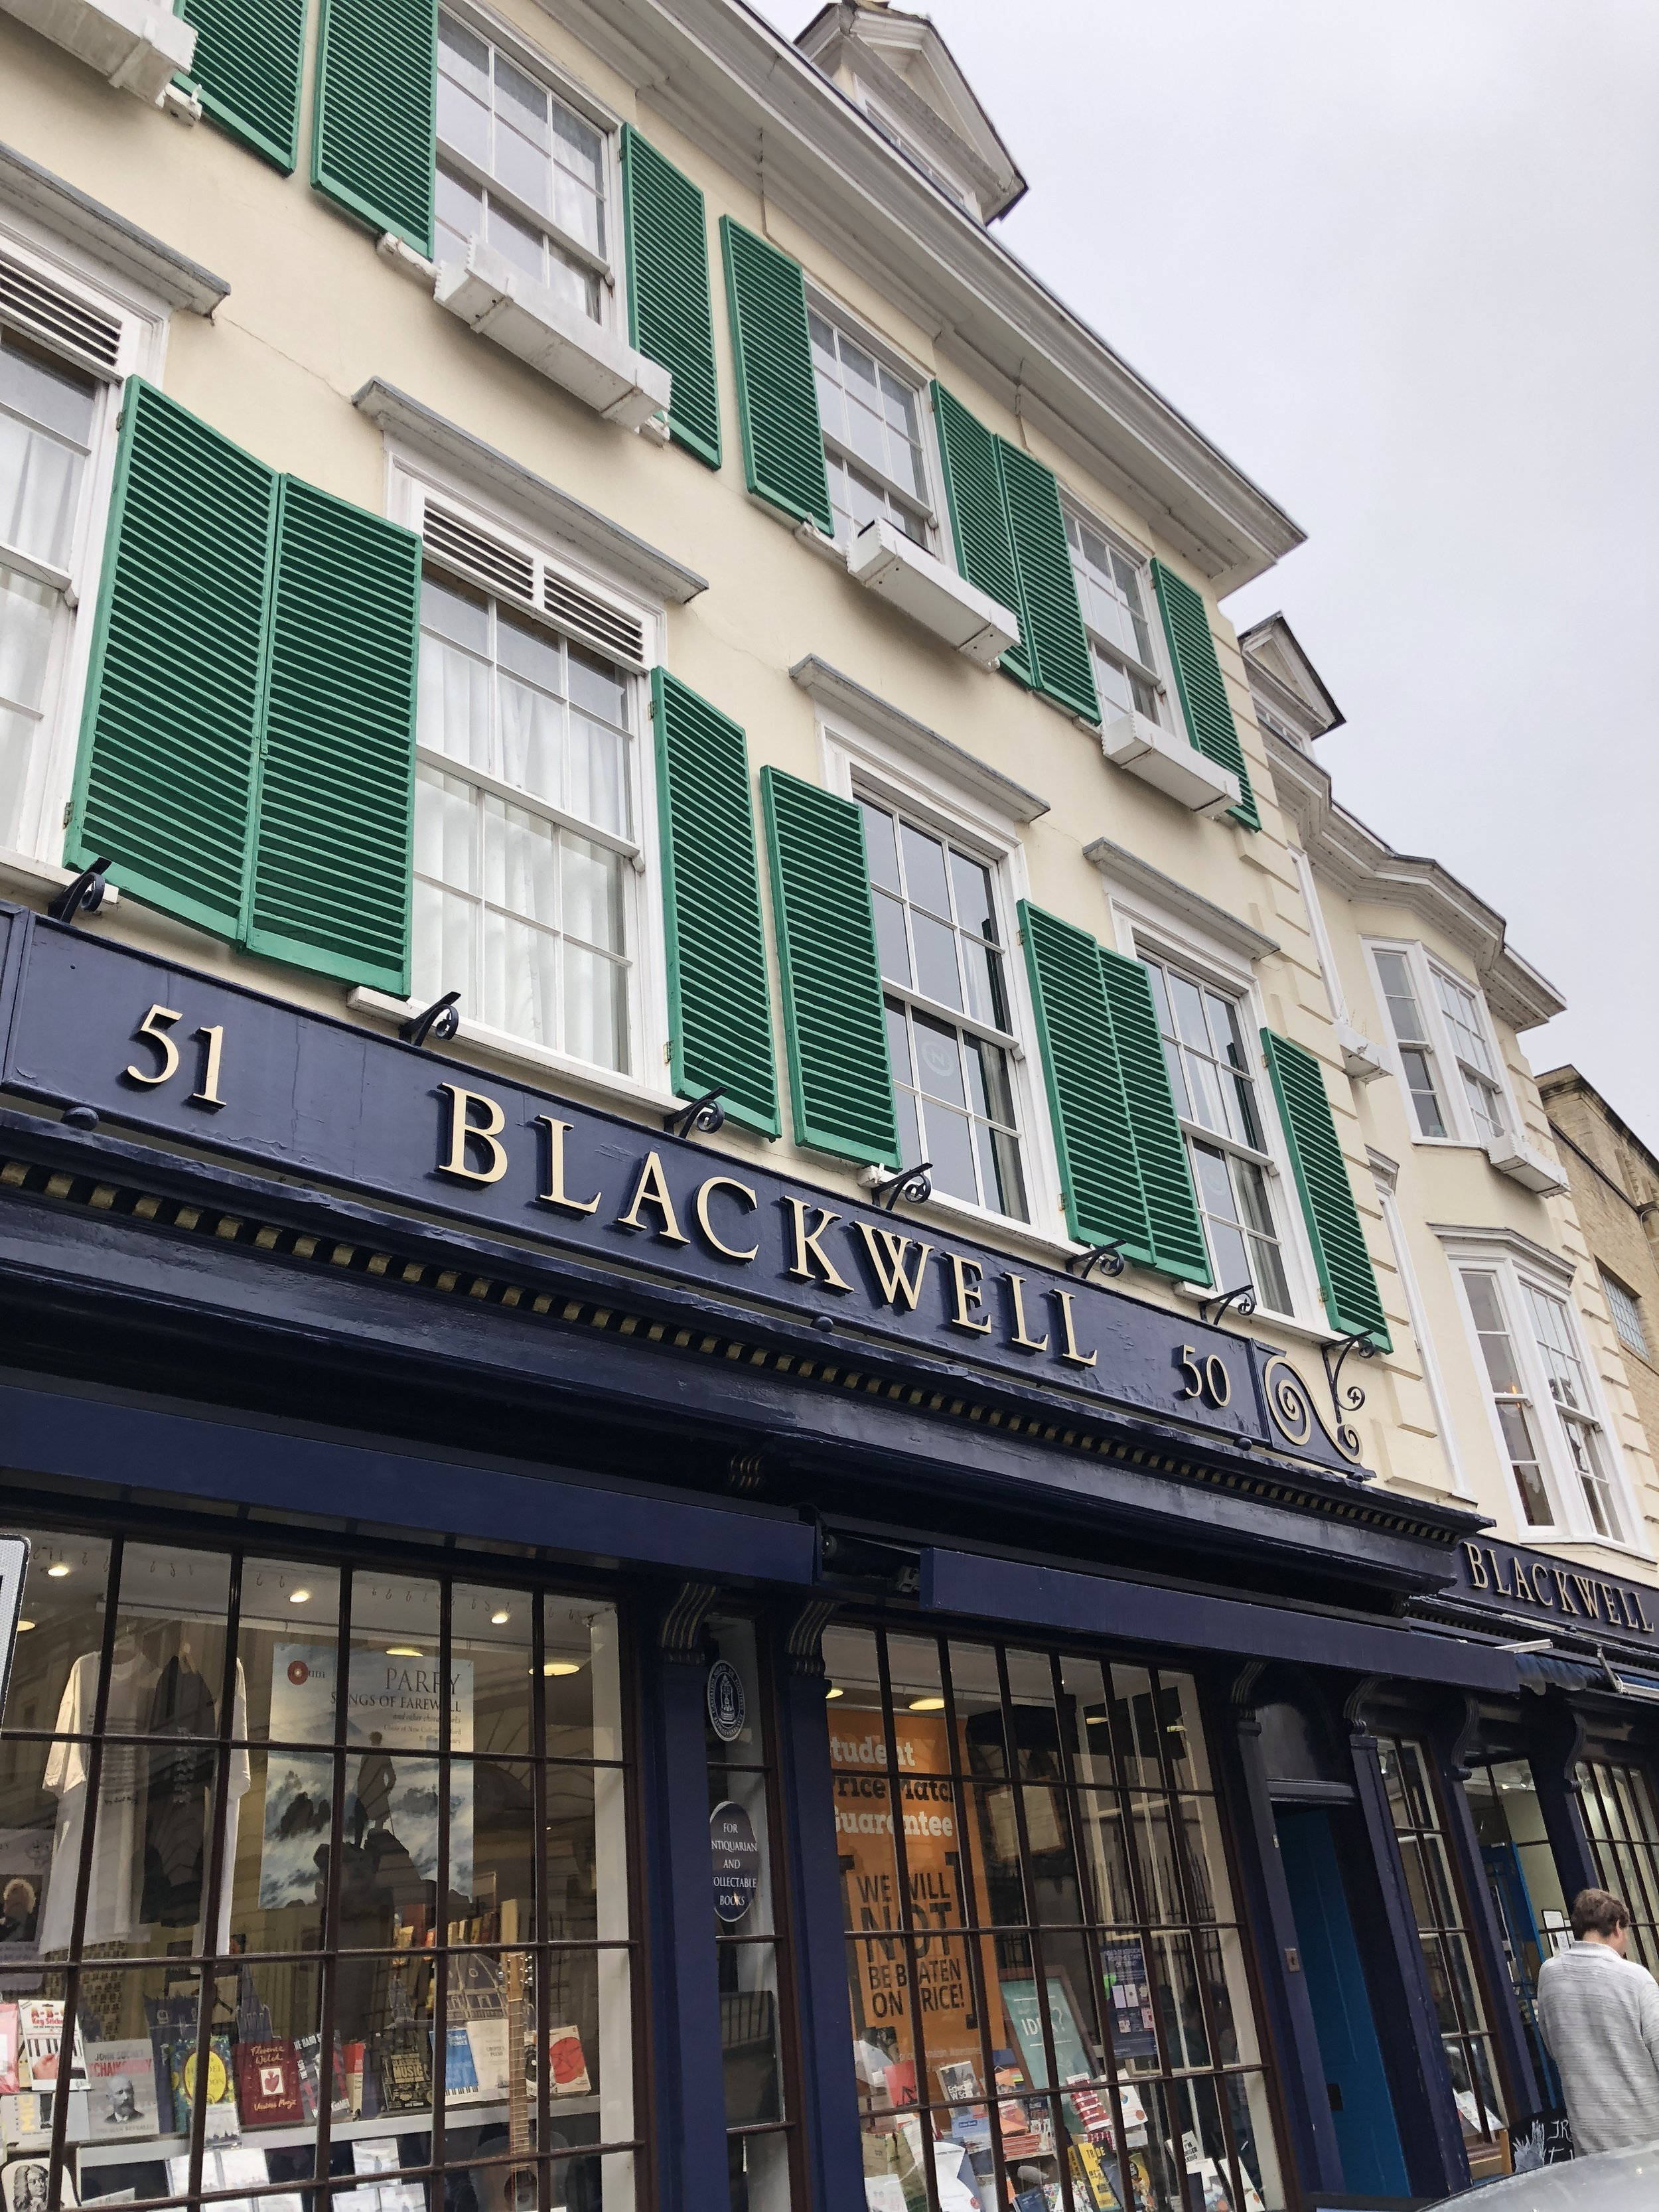 Blackwell Book Store.JPG